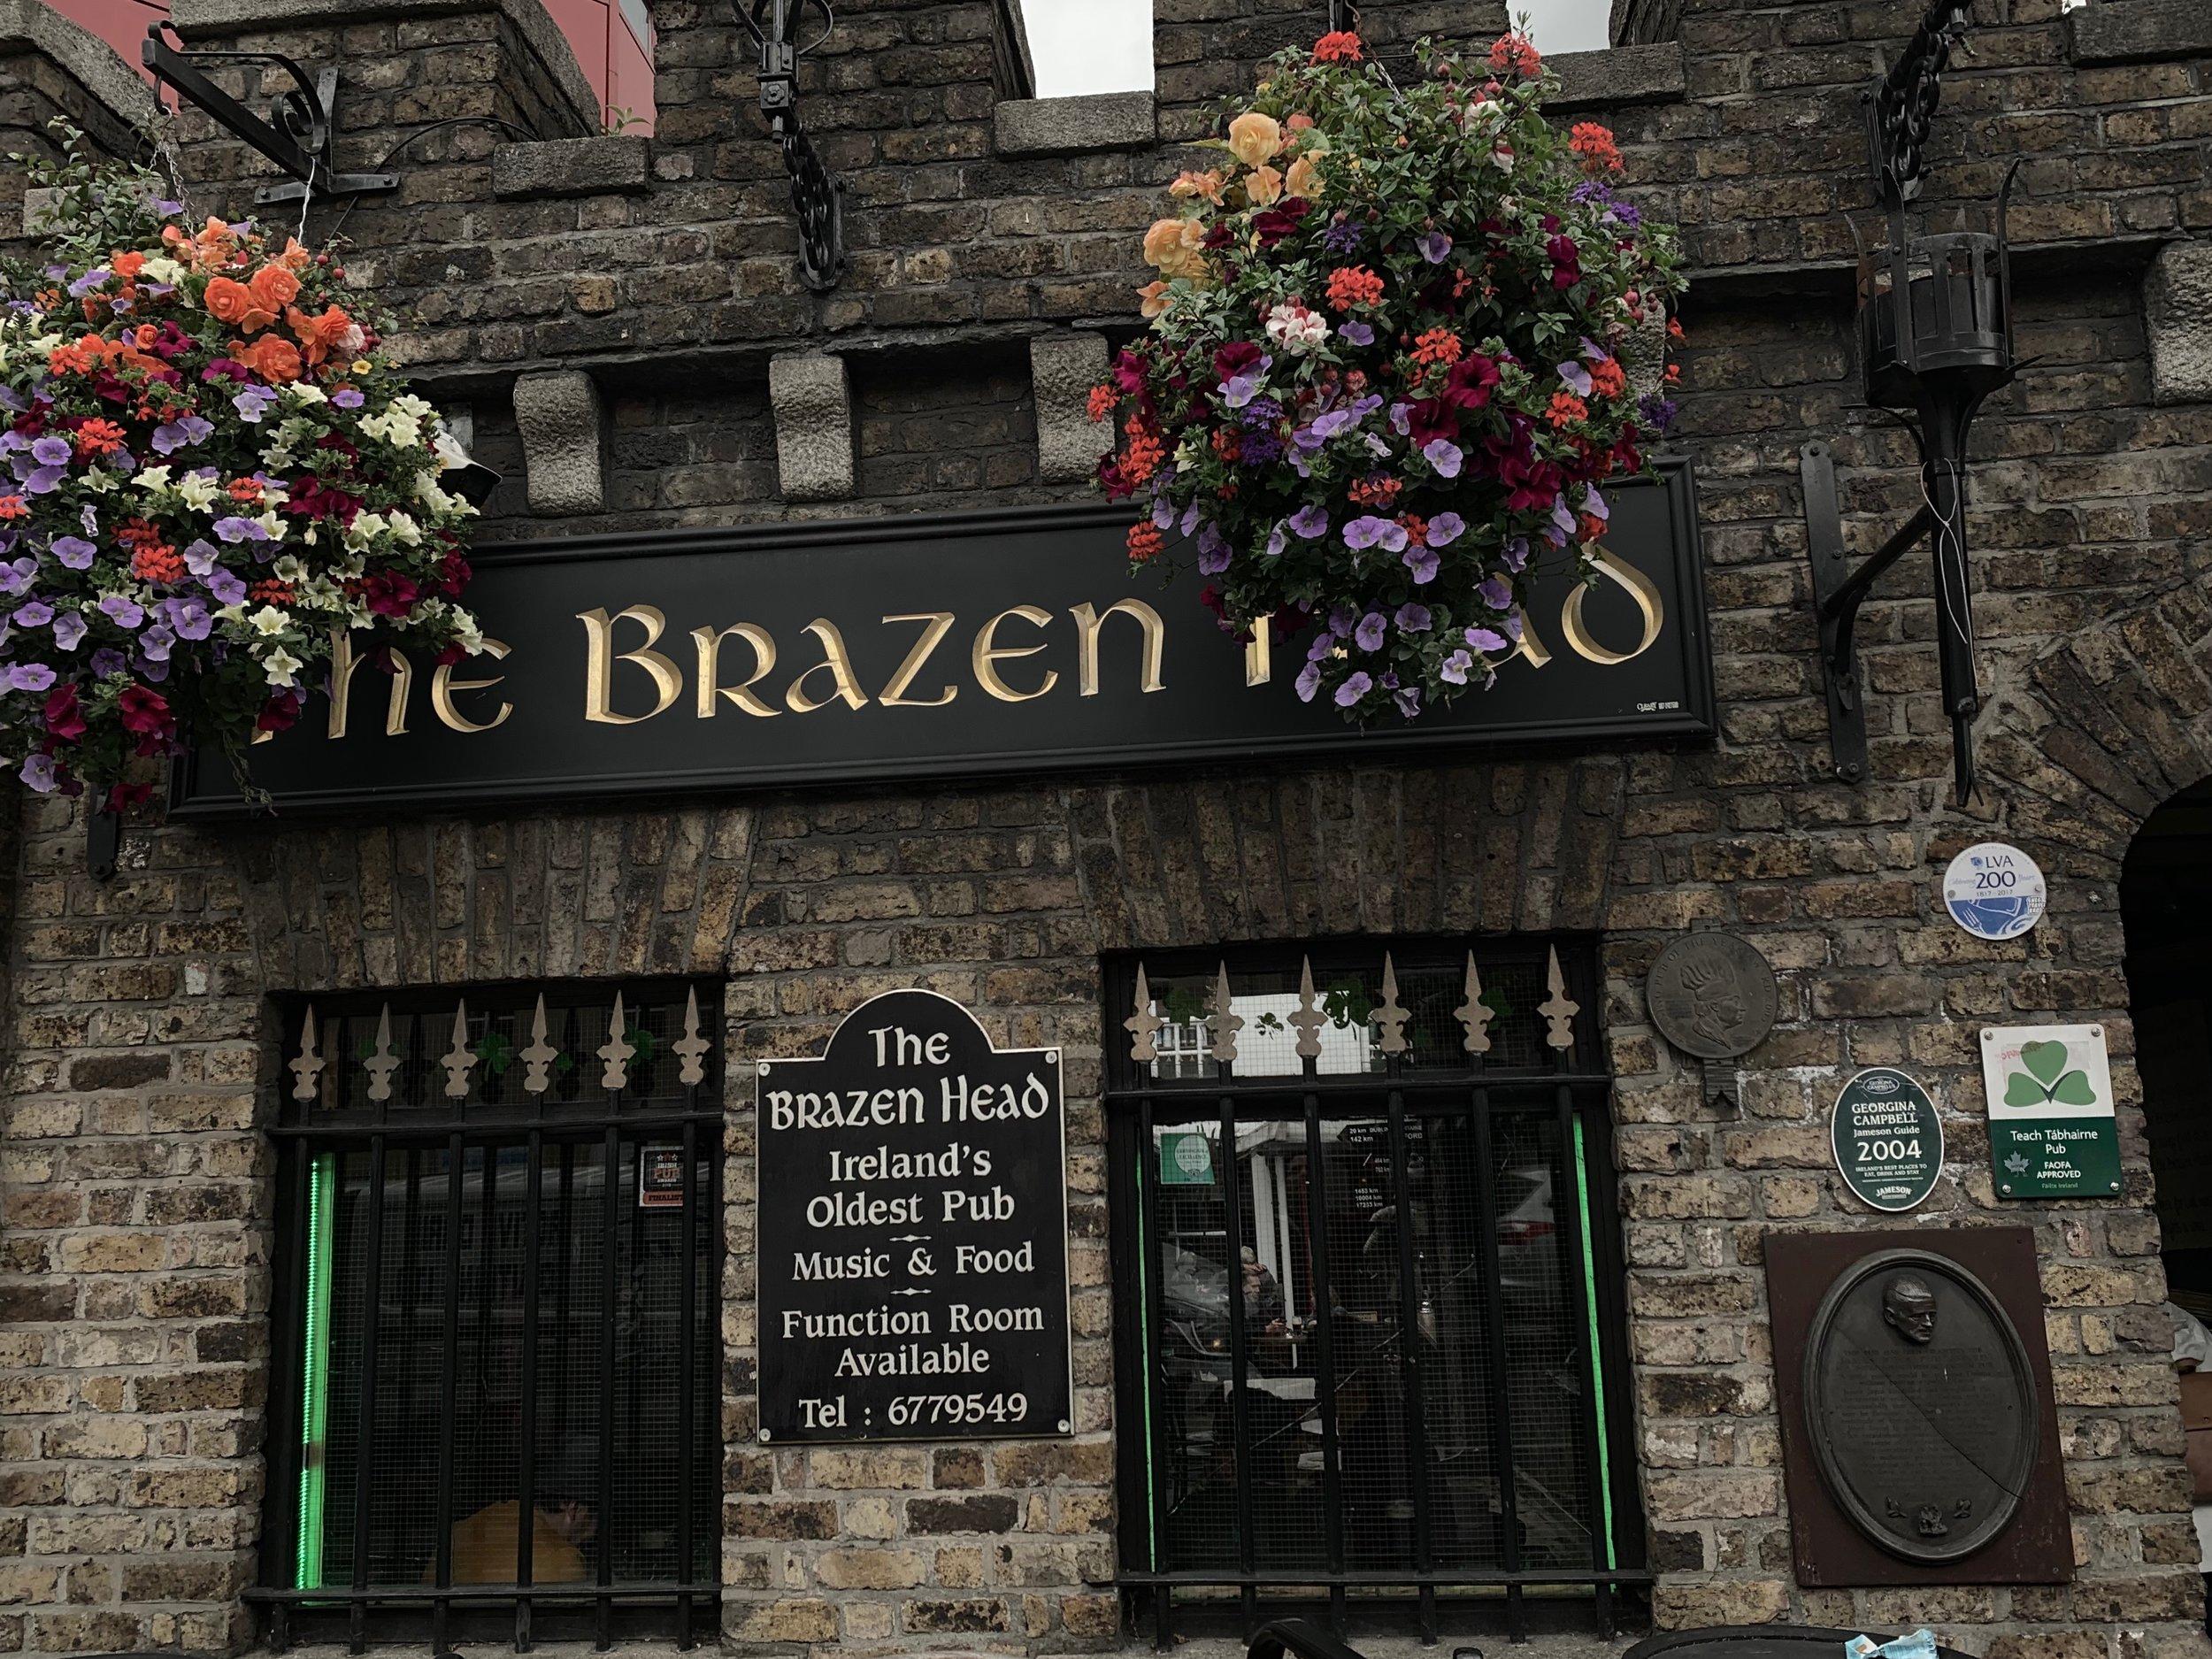 The Brazen Head bar | A Little Guide to Dublin | BySarahRae.com